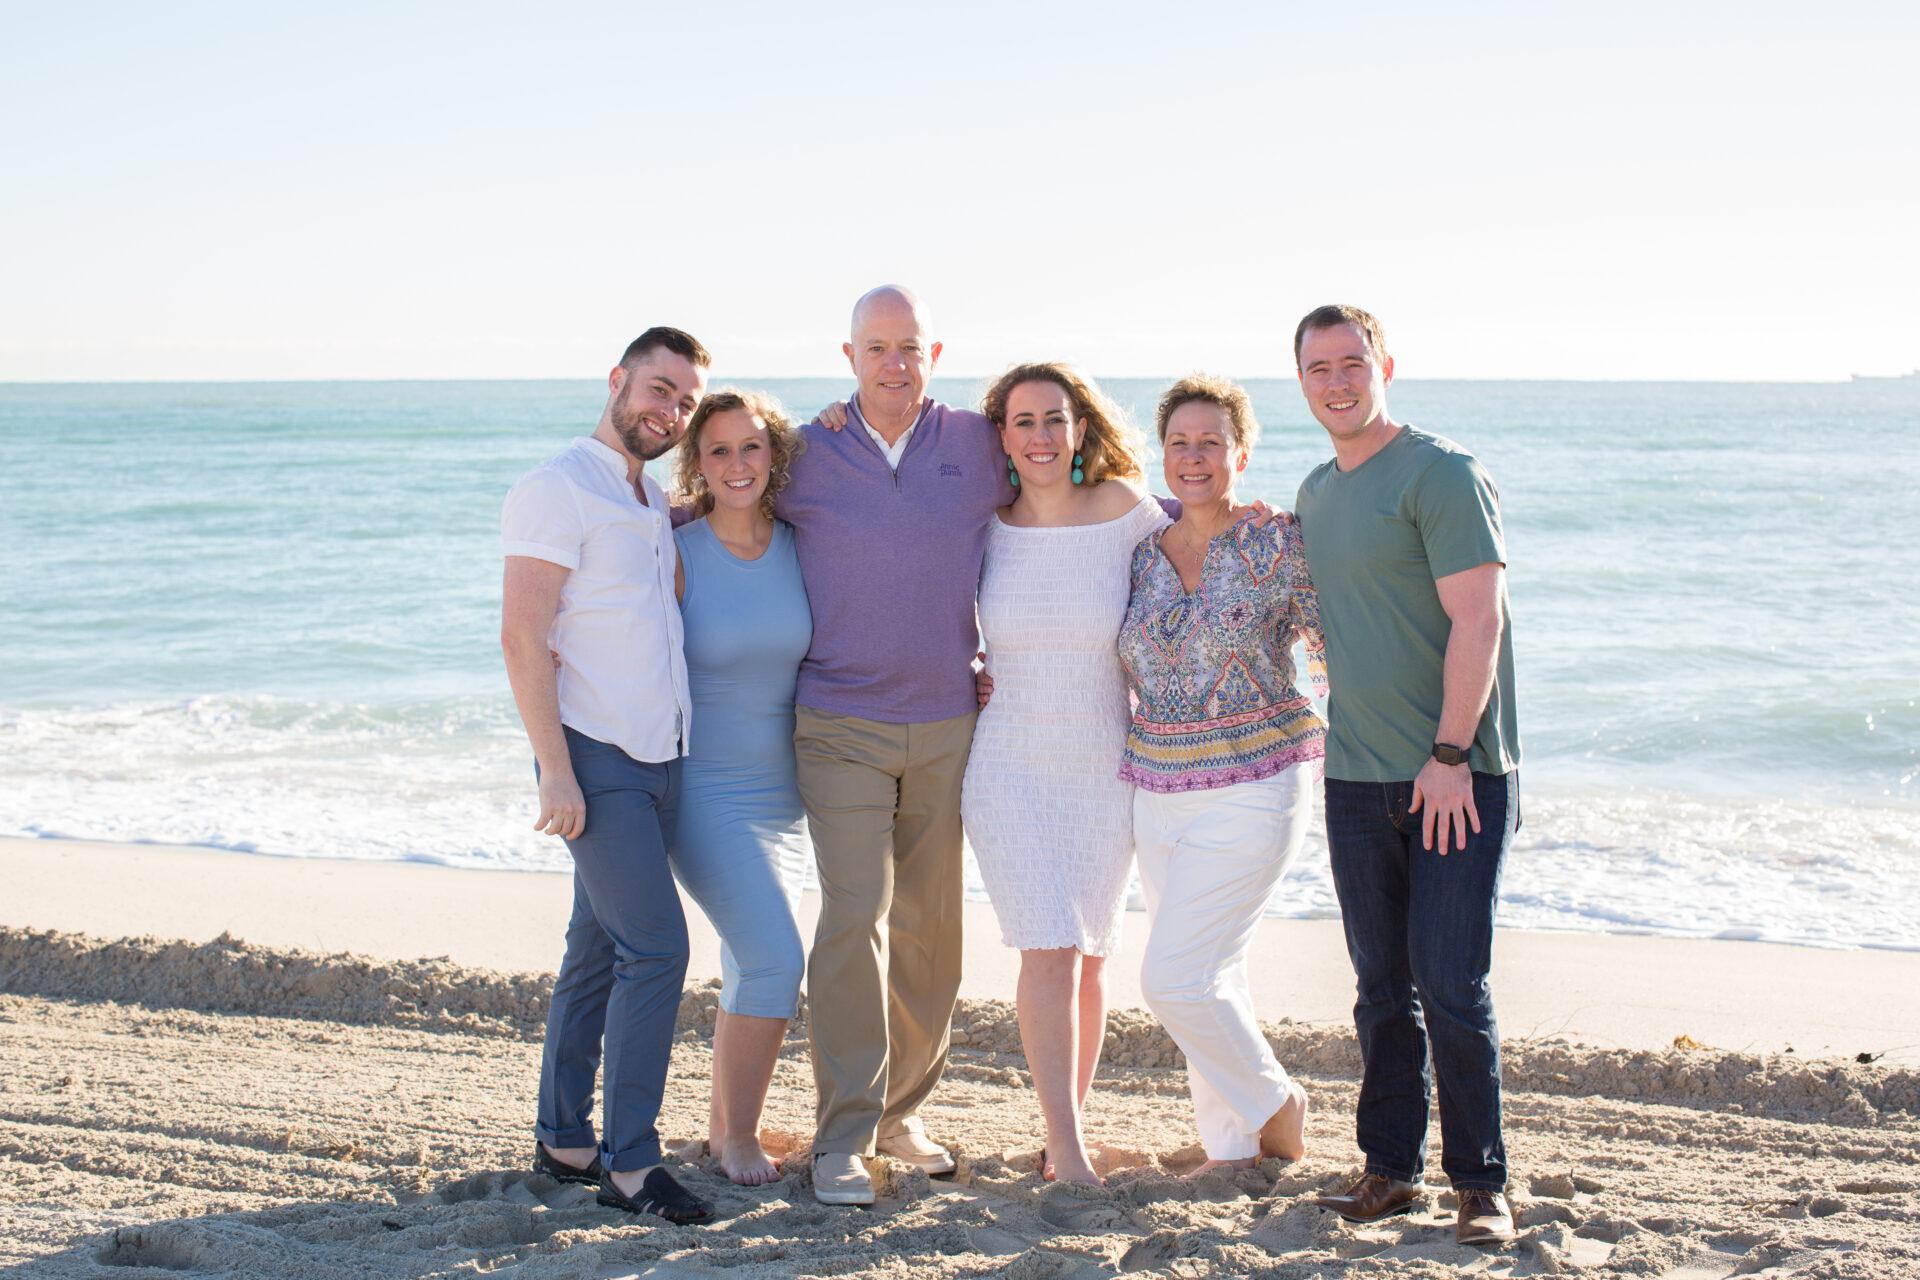 Loews Miami Beach Sunrise Family Photo